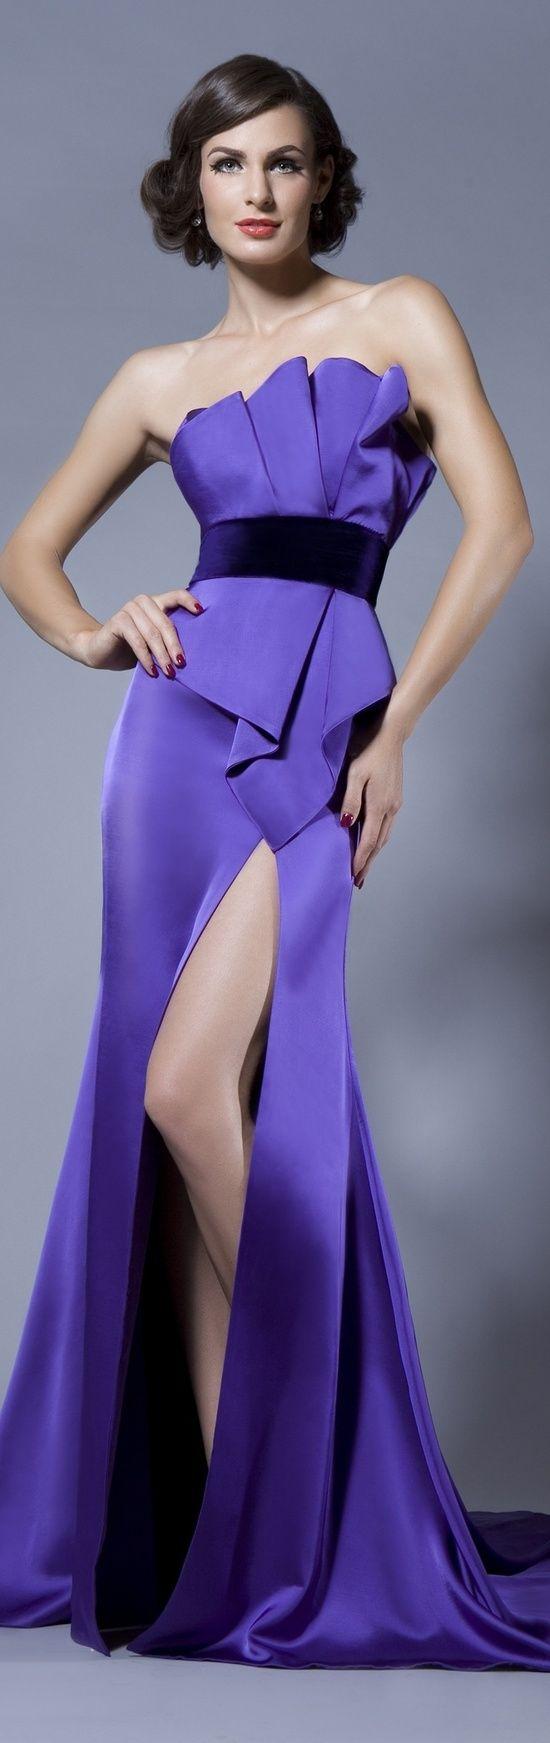 prom dresses   2013-2014